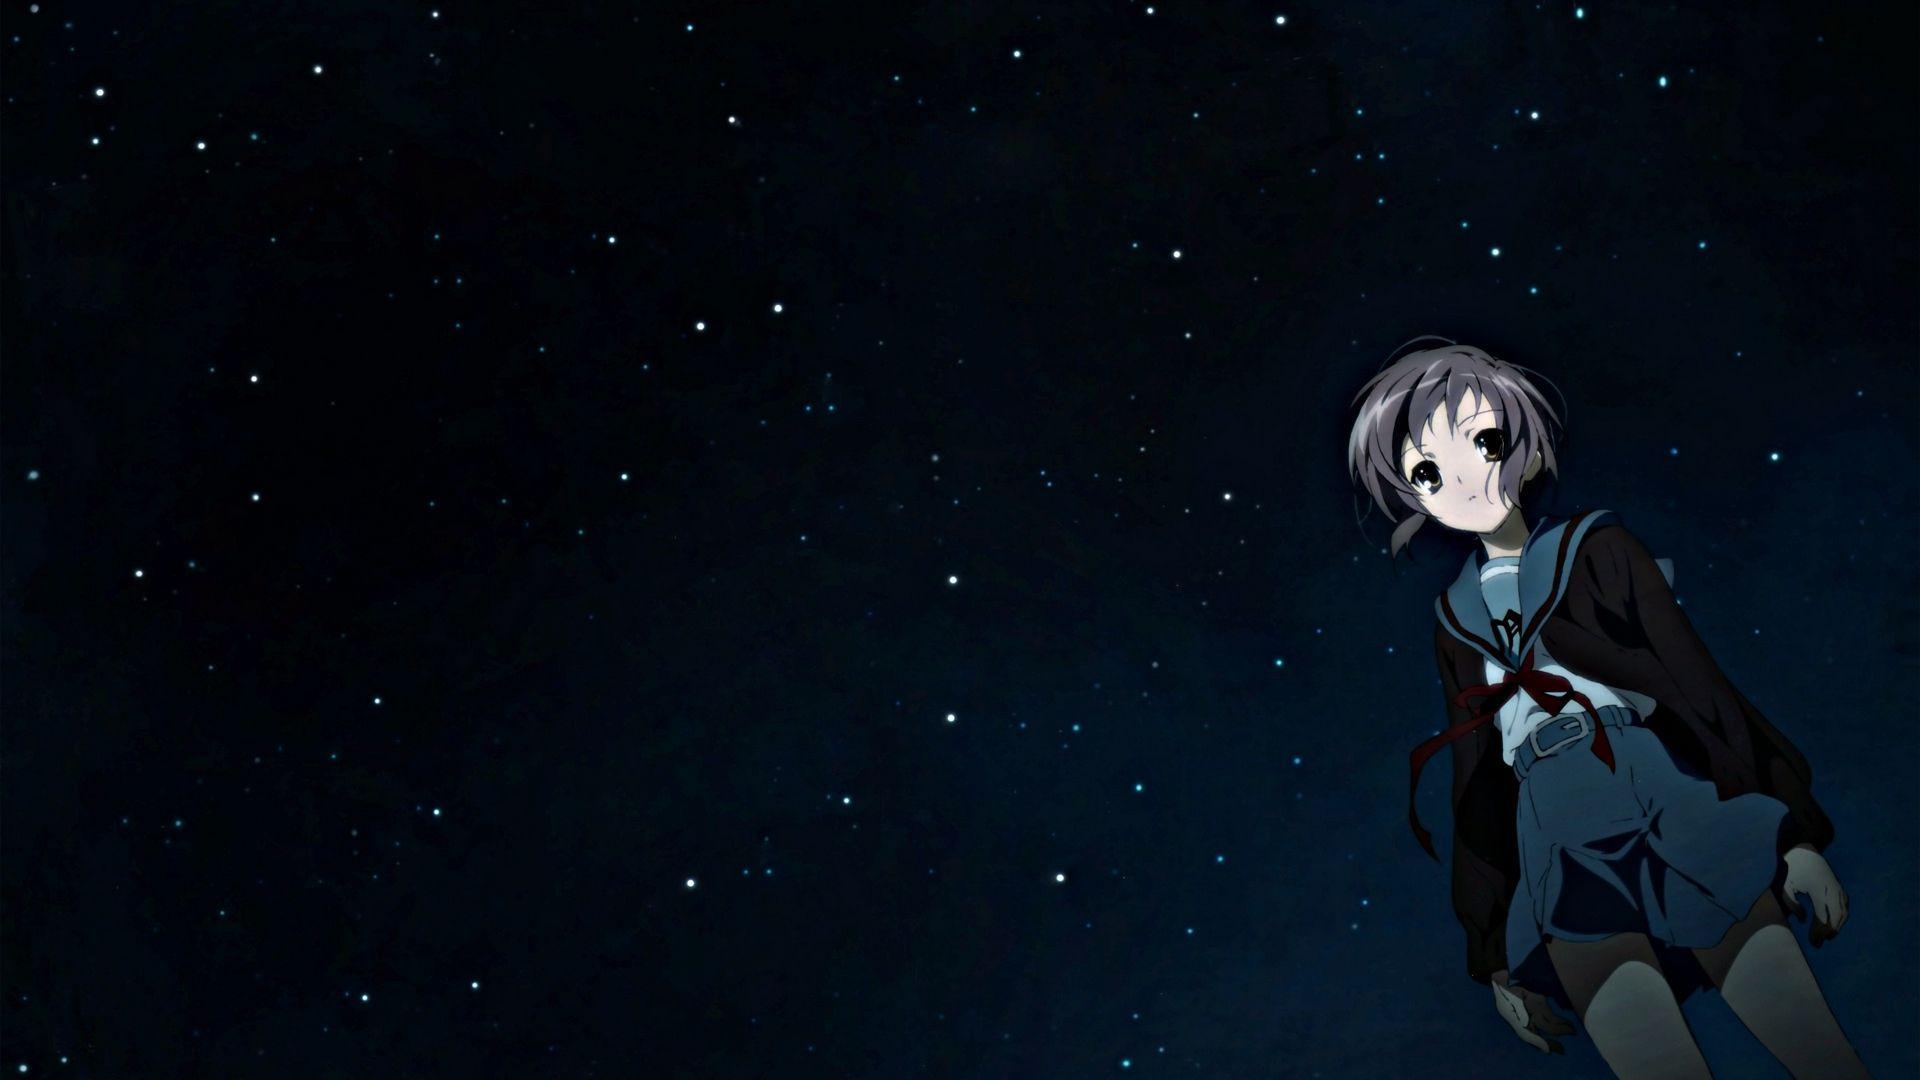 Anime Night Sky Wallpapers